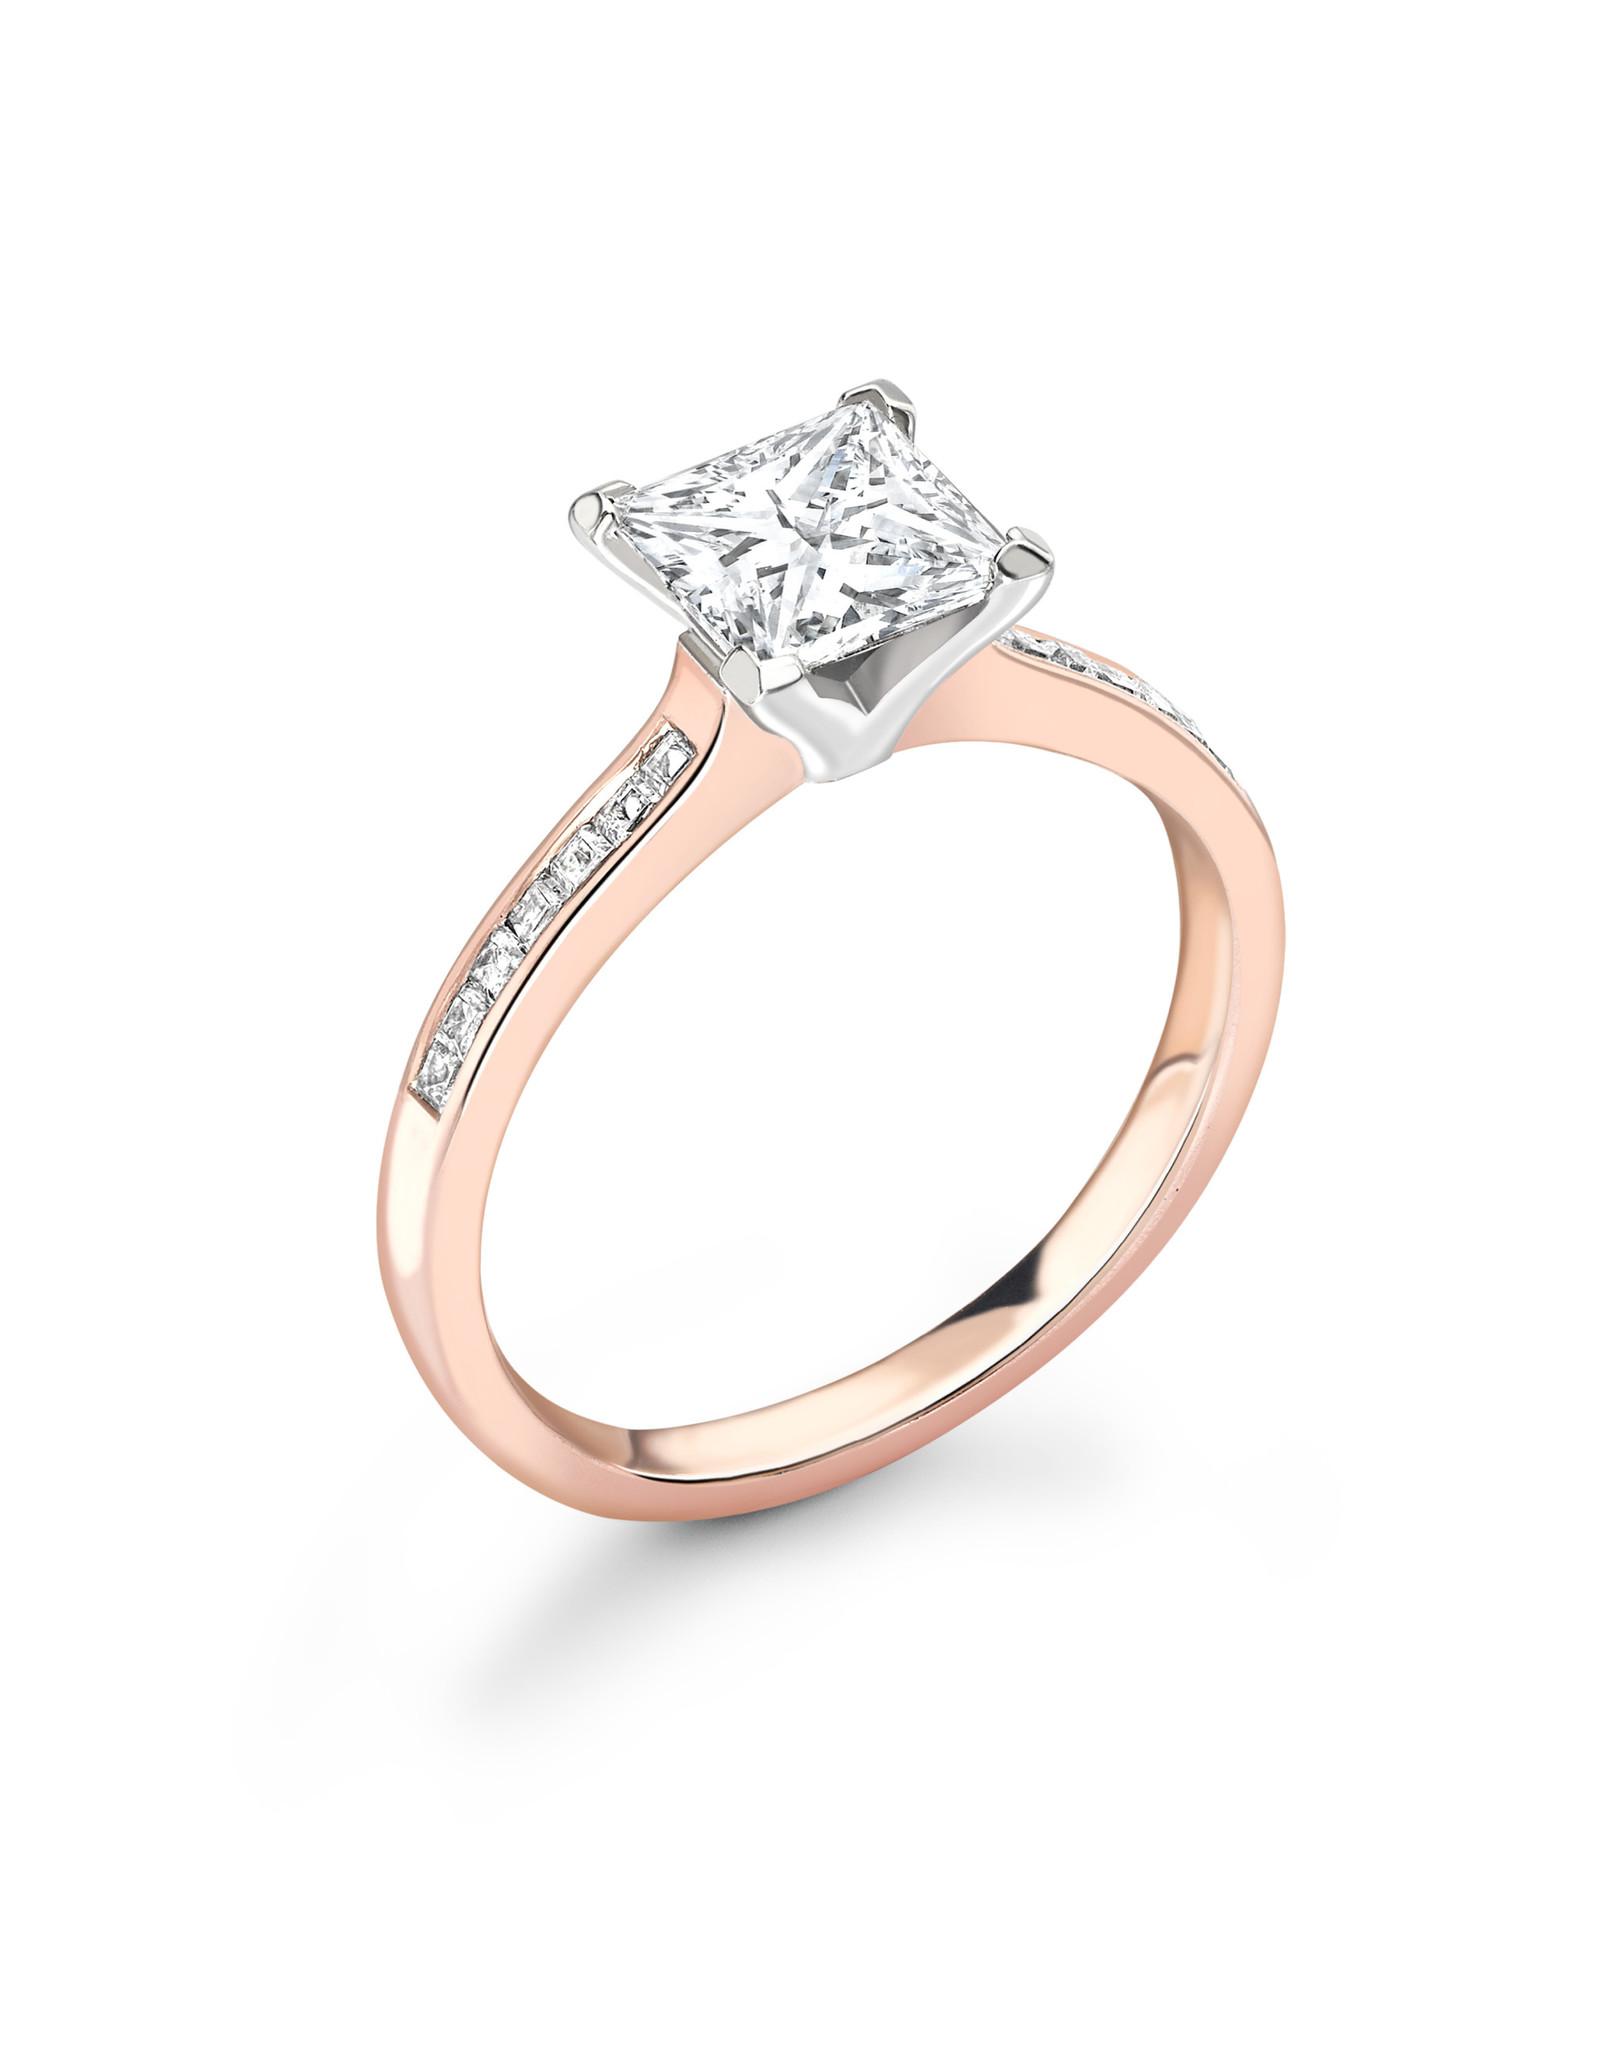 LVN Princesse Verlovingsring Met Zijsteentjes LVNRX3092